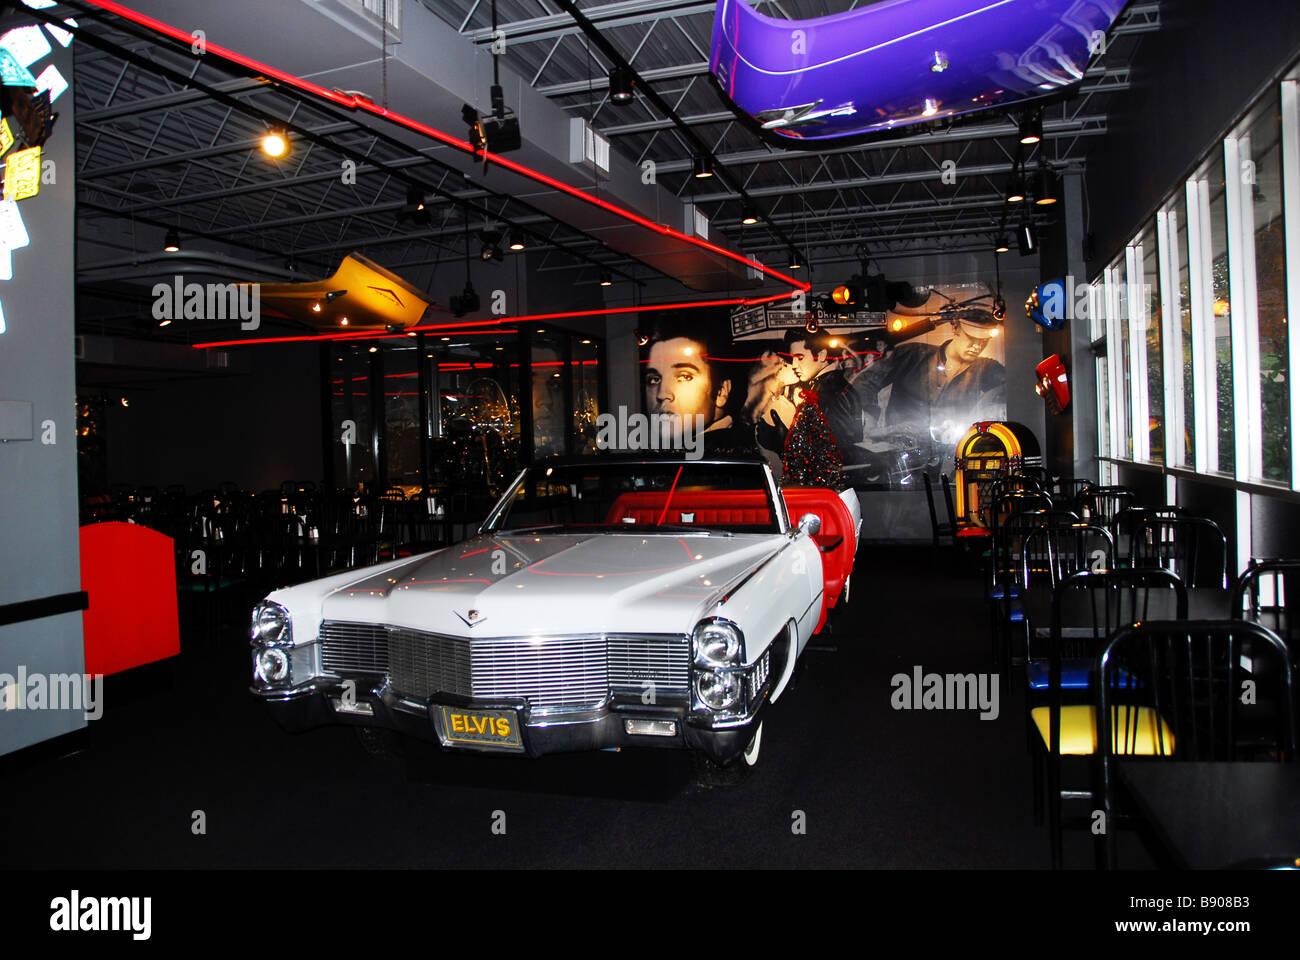 Elvis Presley Car Stock Photos Elvis Presley Car Stock Images - Car show memphis tn